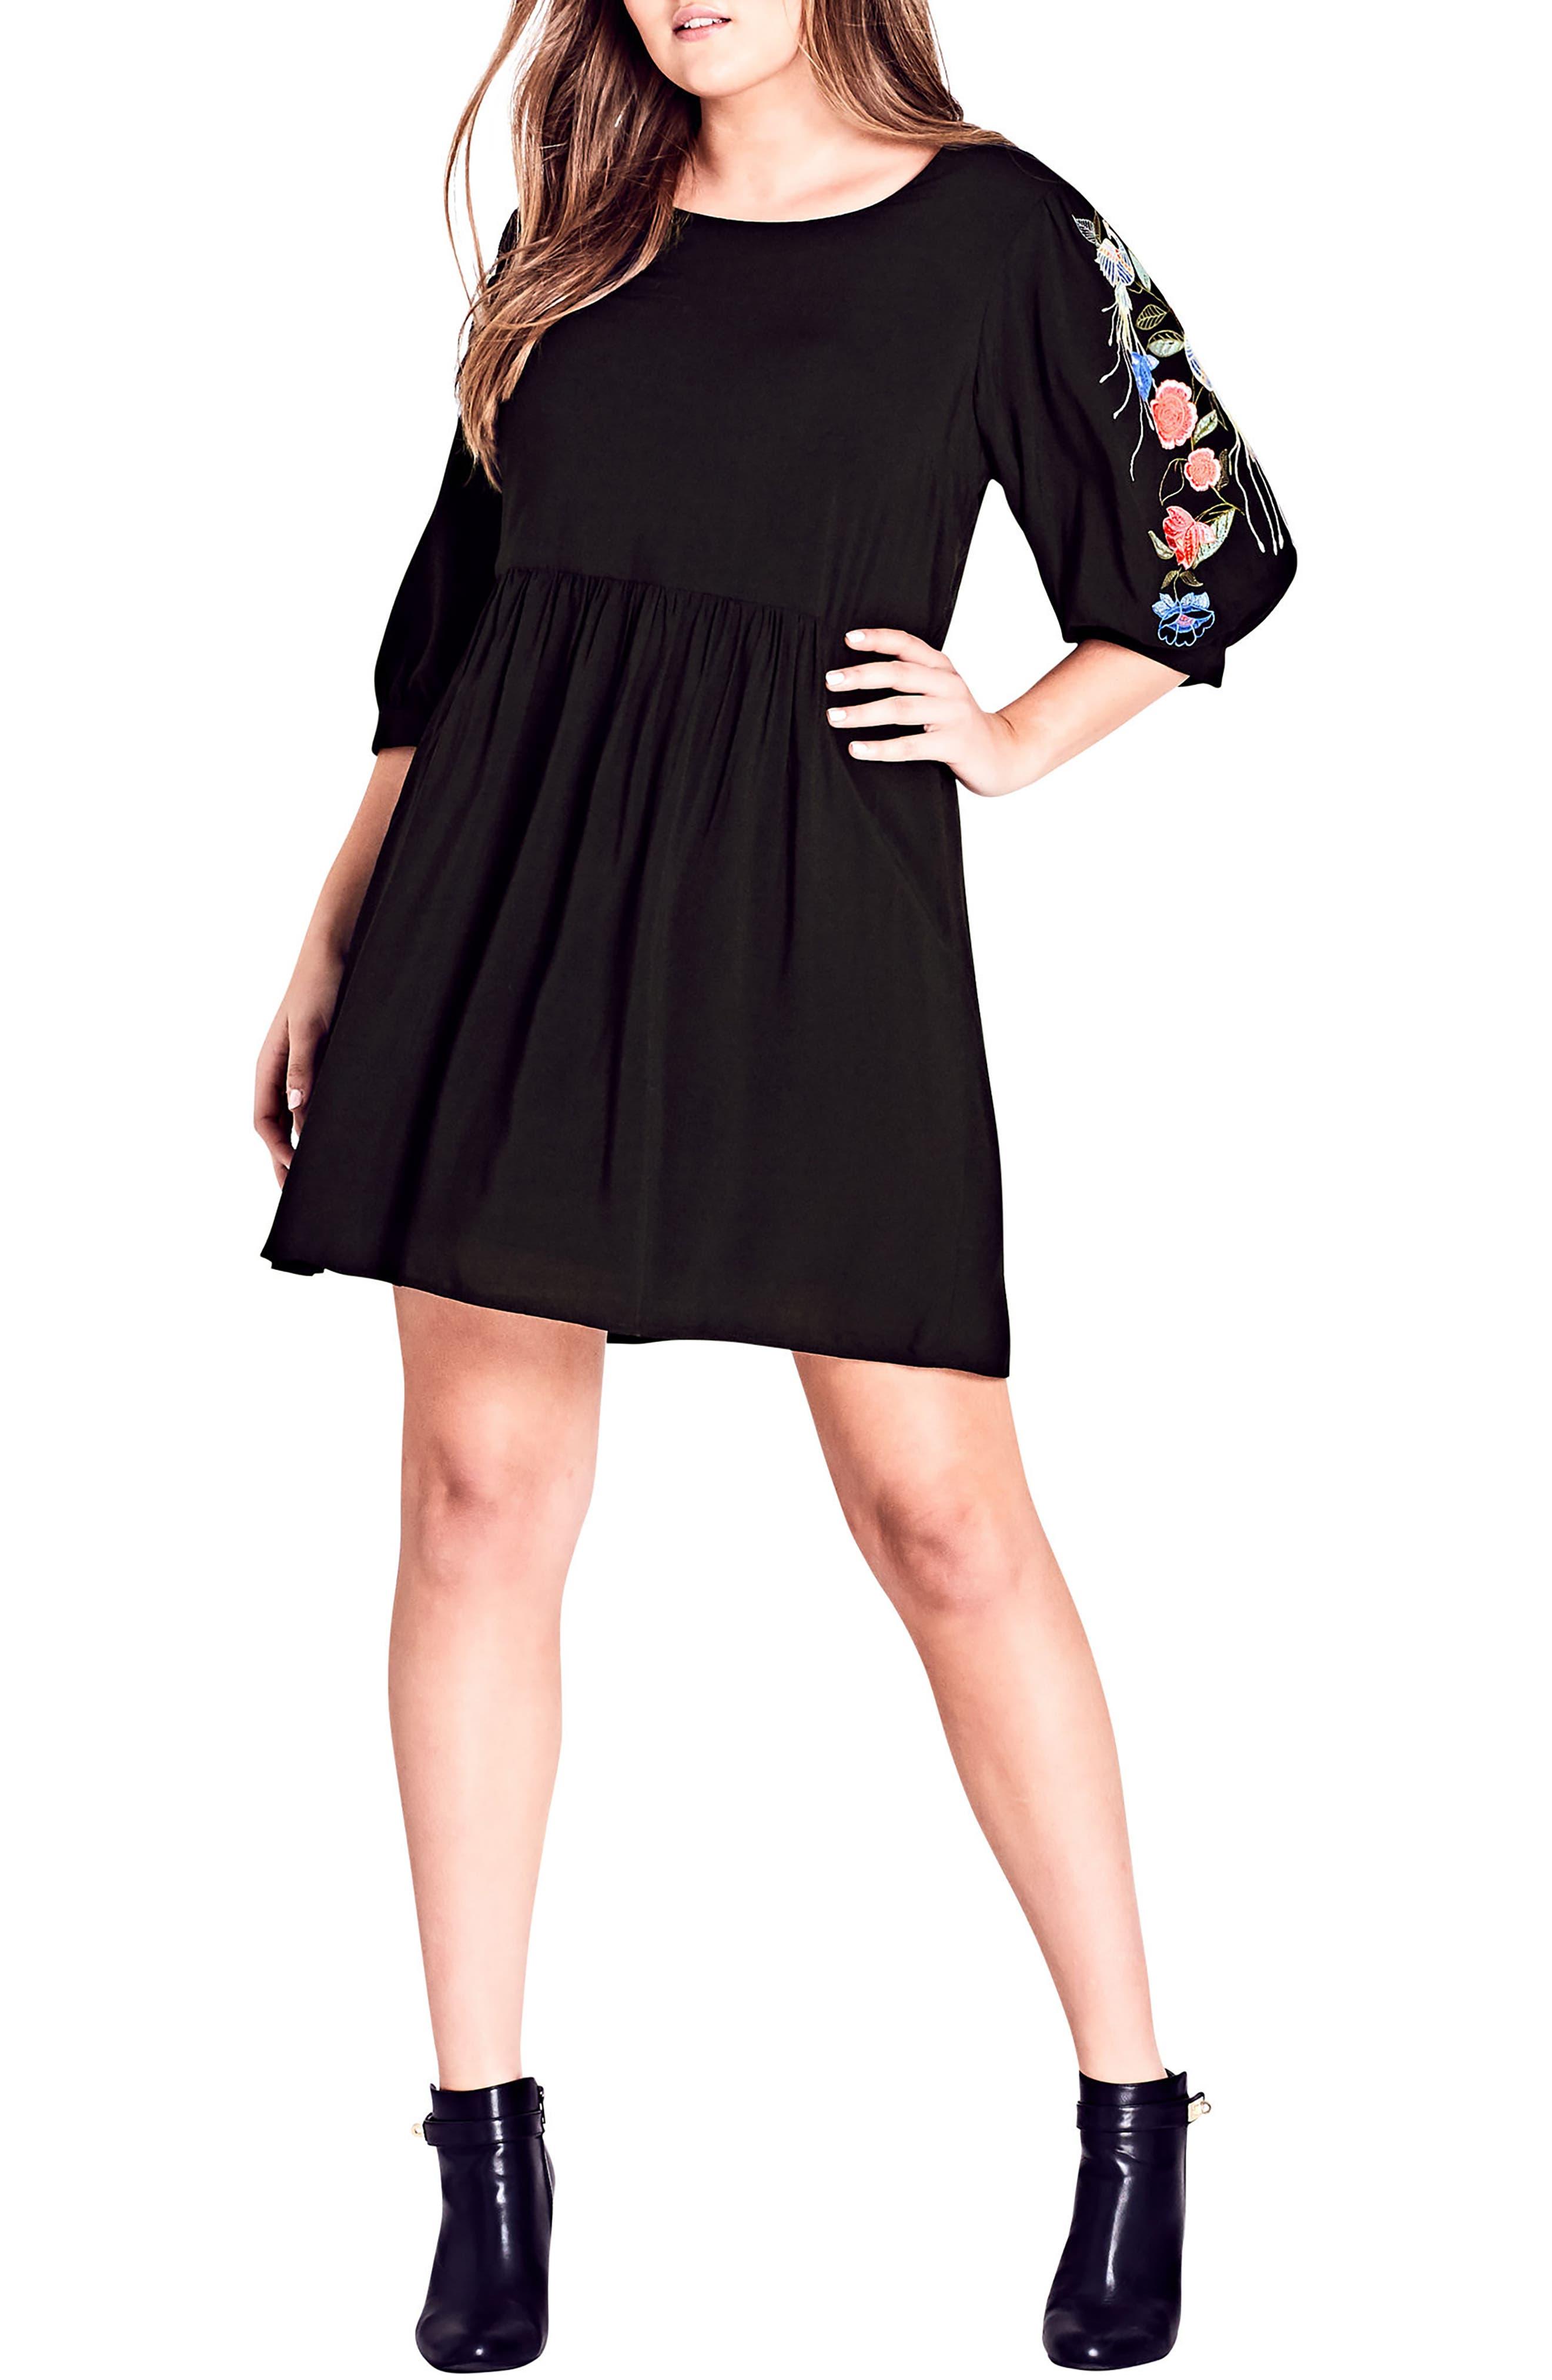 Phoenix Dress,                             Main thumbnail 1, color,                             Black